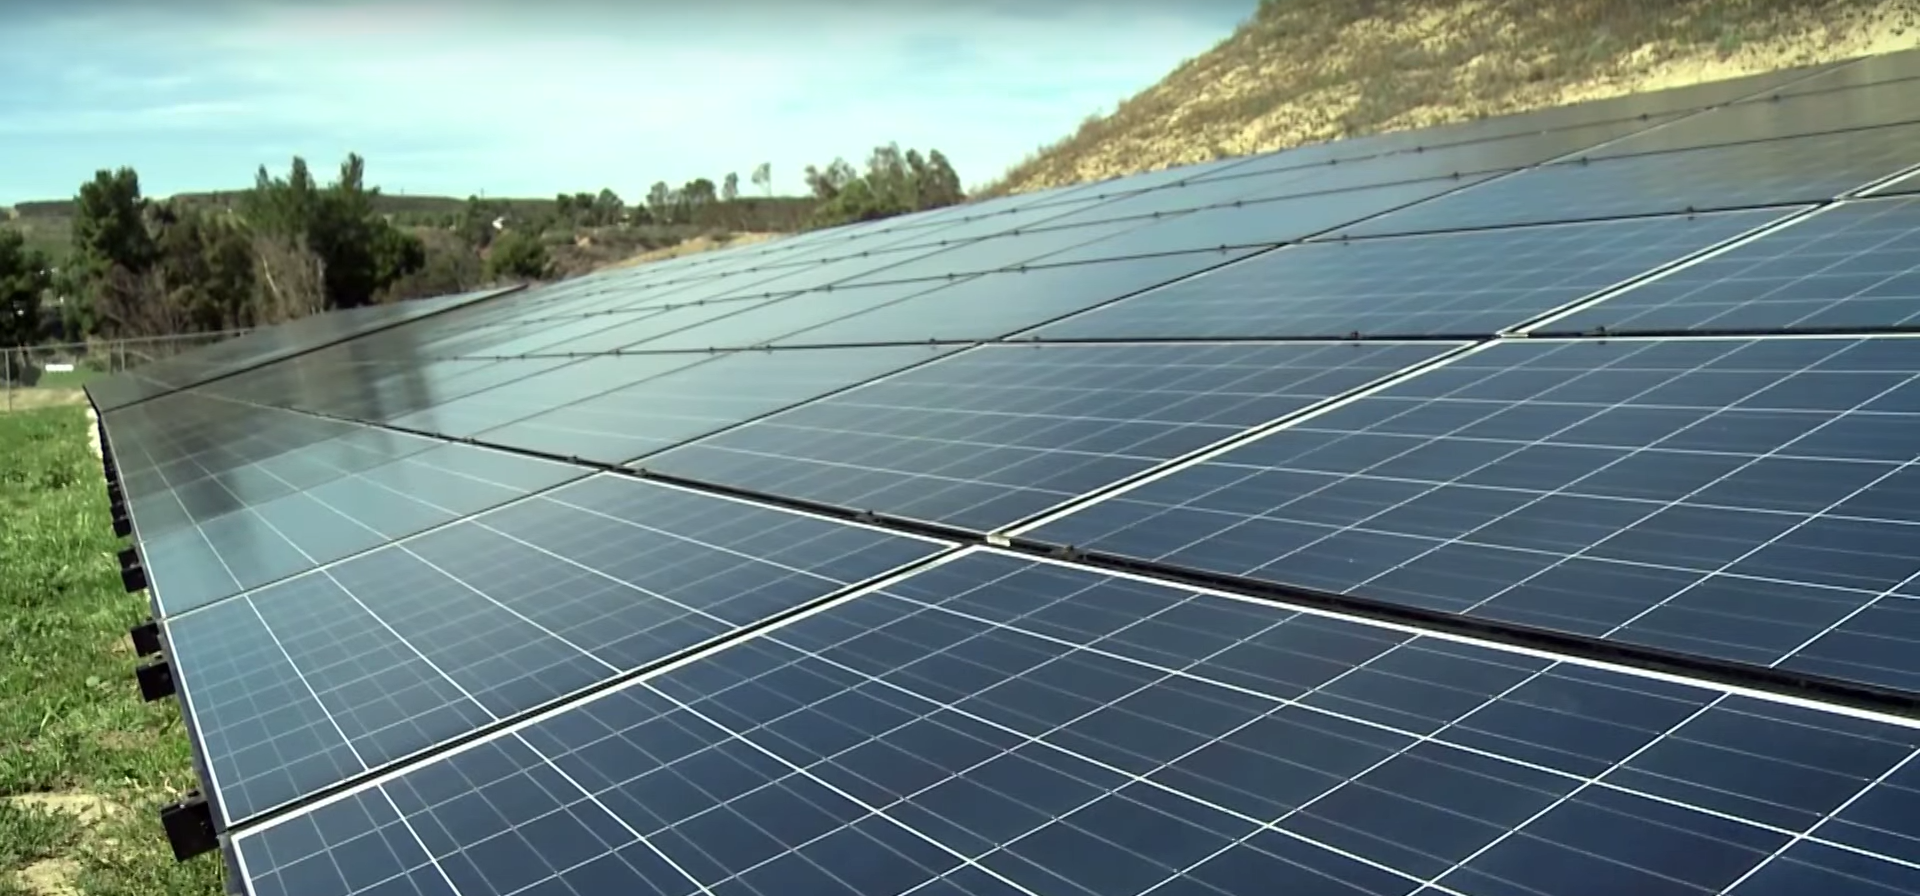 Solar power in California. Photo by: CCTV America / YouTube